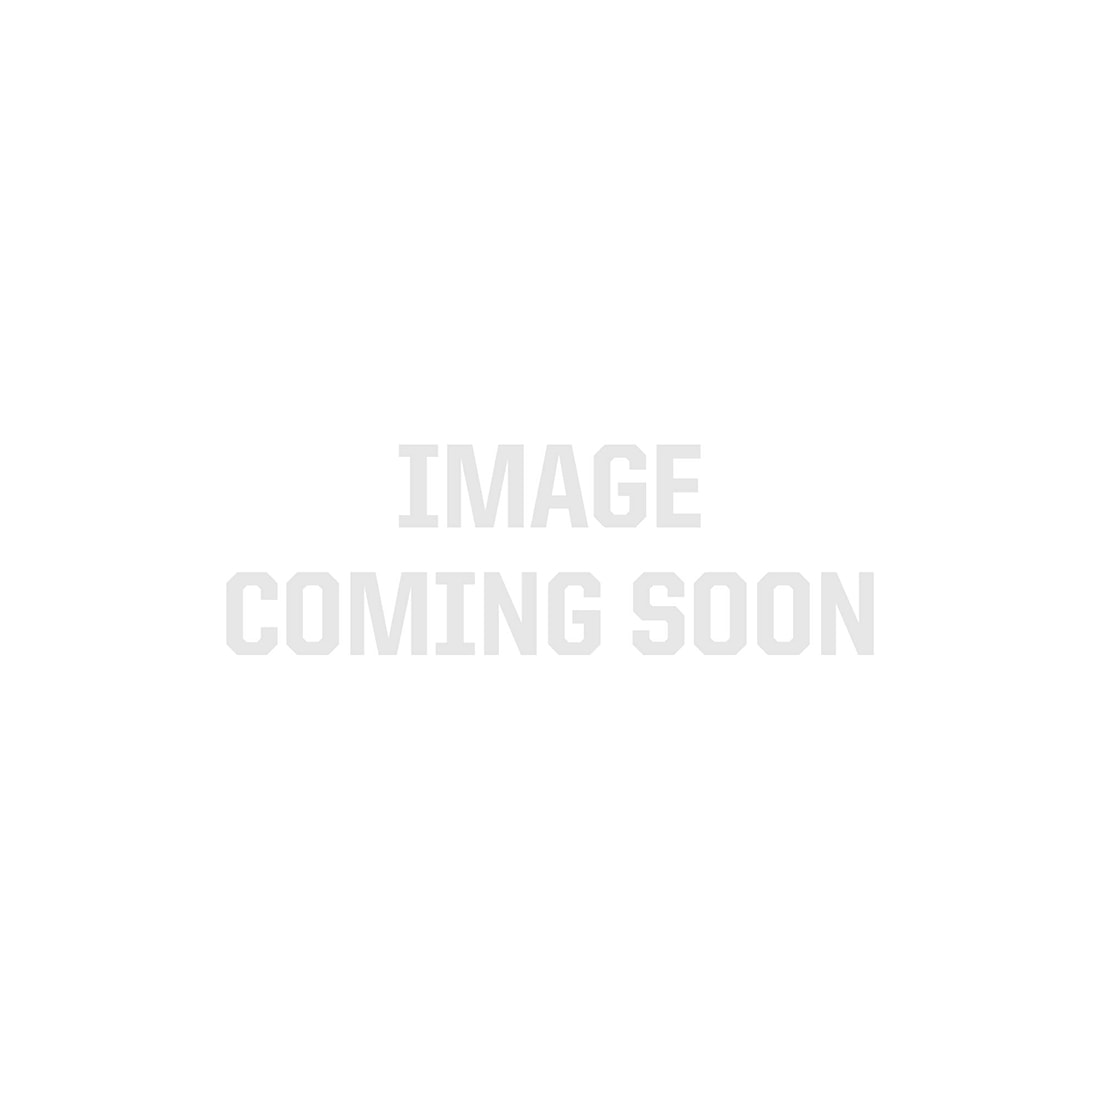 Universal Dimming Driver - 24 VDC - 3x96W